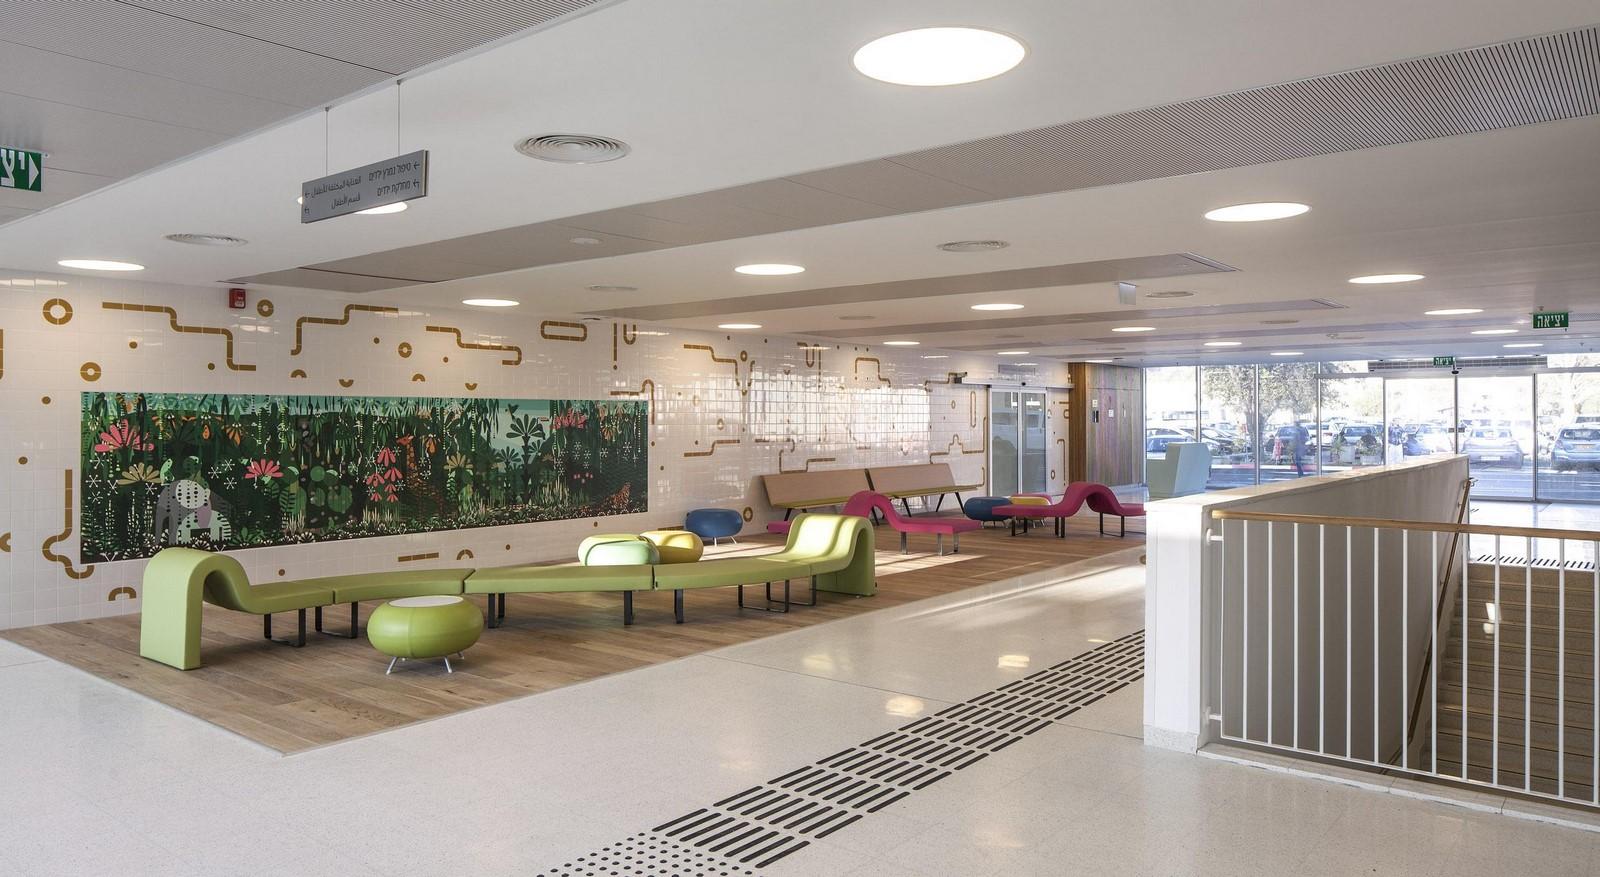 The Sieff Hospital, Israel - Sheet3